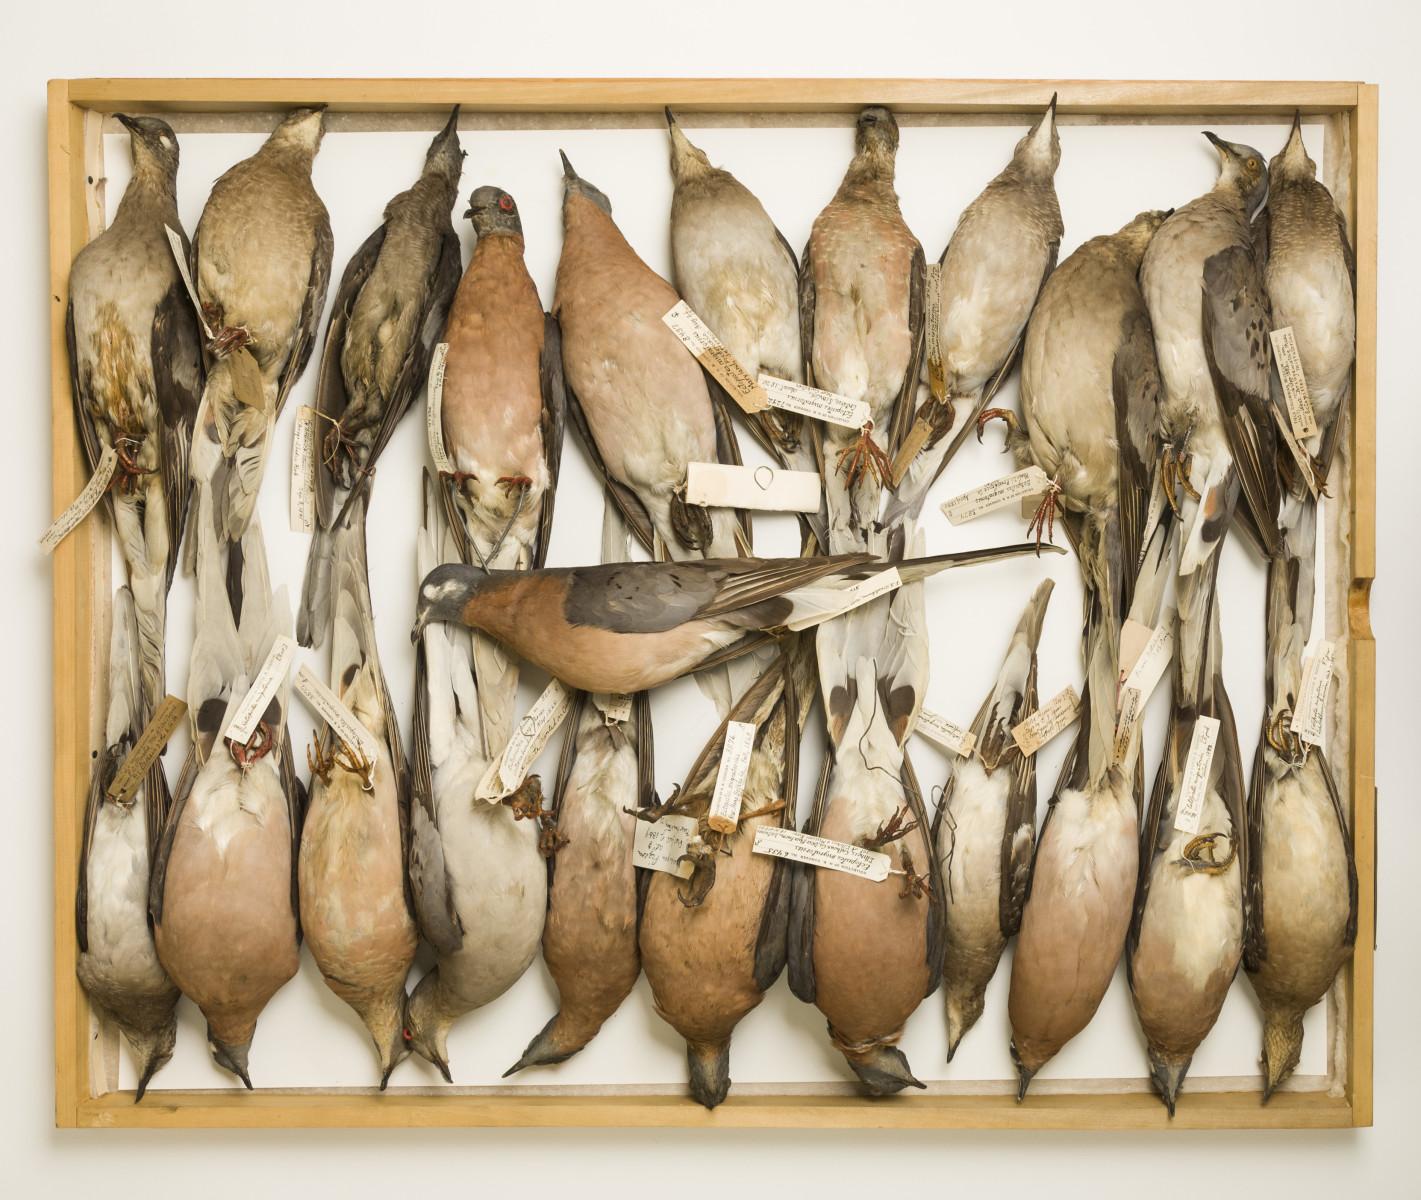 Passenger pigeon bird Ectopistes migratorius - Extinction